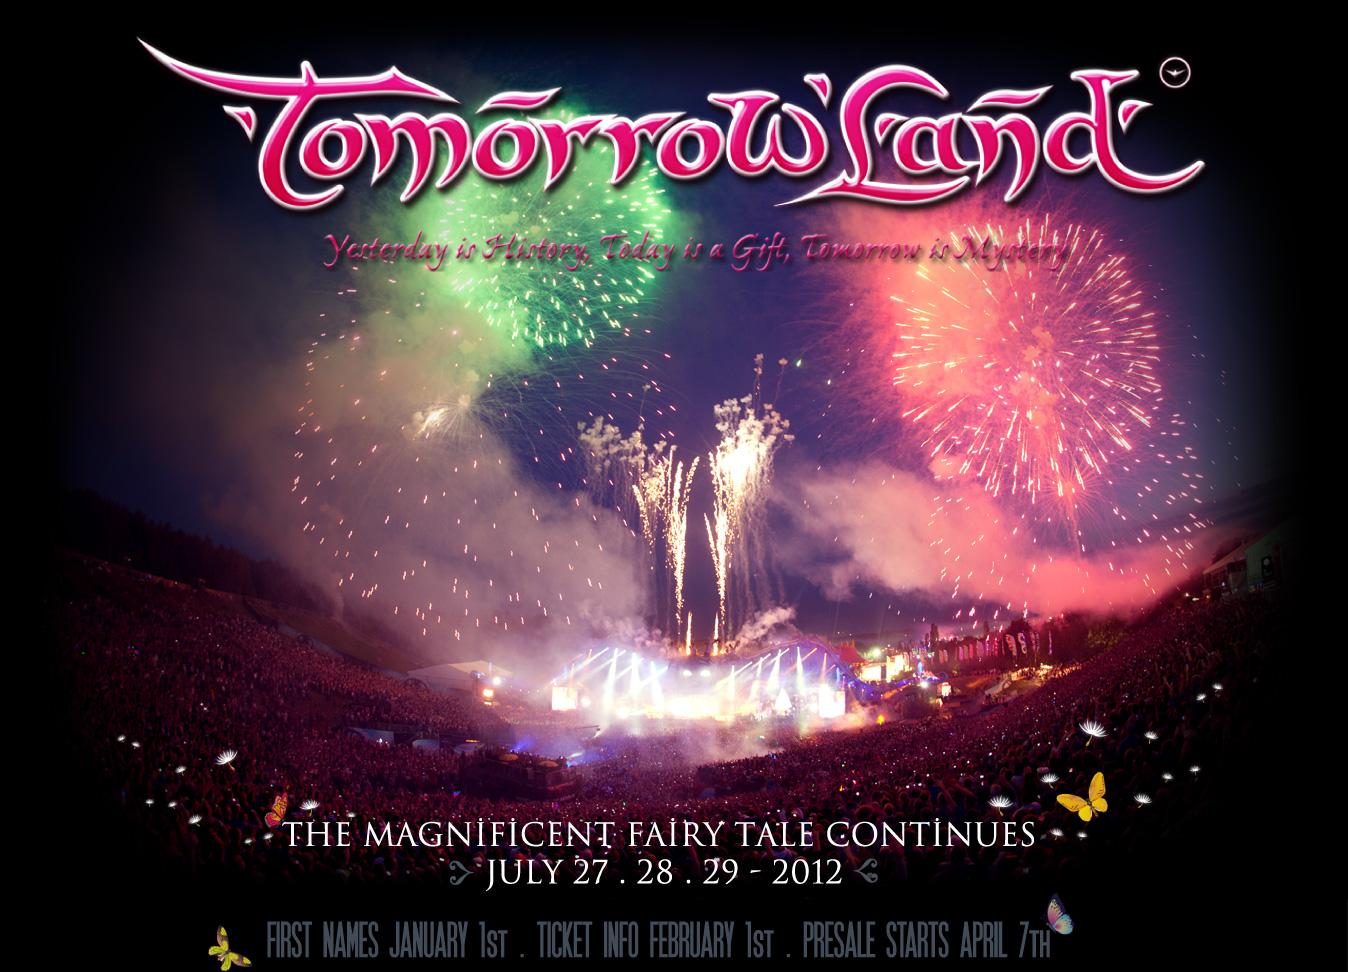 http://4.bp.blogspot.com/-MFEOKFp4eiU/UBNCsVEfe-I/AAAAAAAAD5M/oVznoIah6ys/s1600/Tomorrowland+Avicii_live+27-07-2012+%5BWww.MixSoundSystem.coM%5D.jpg